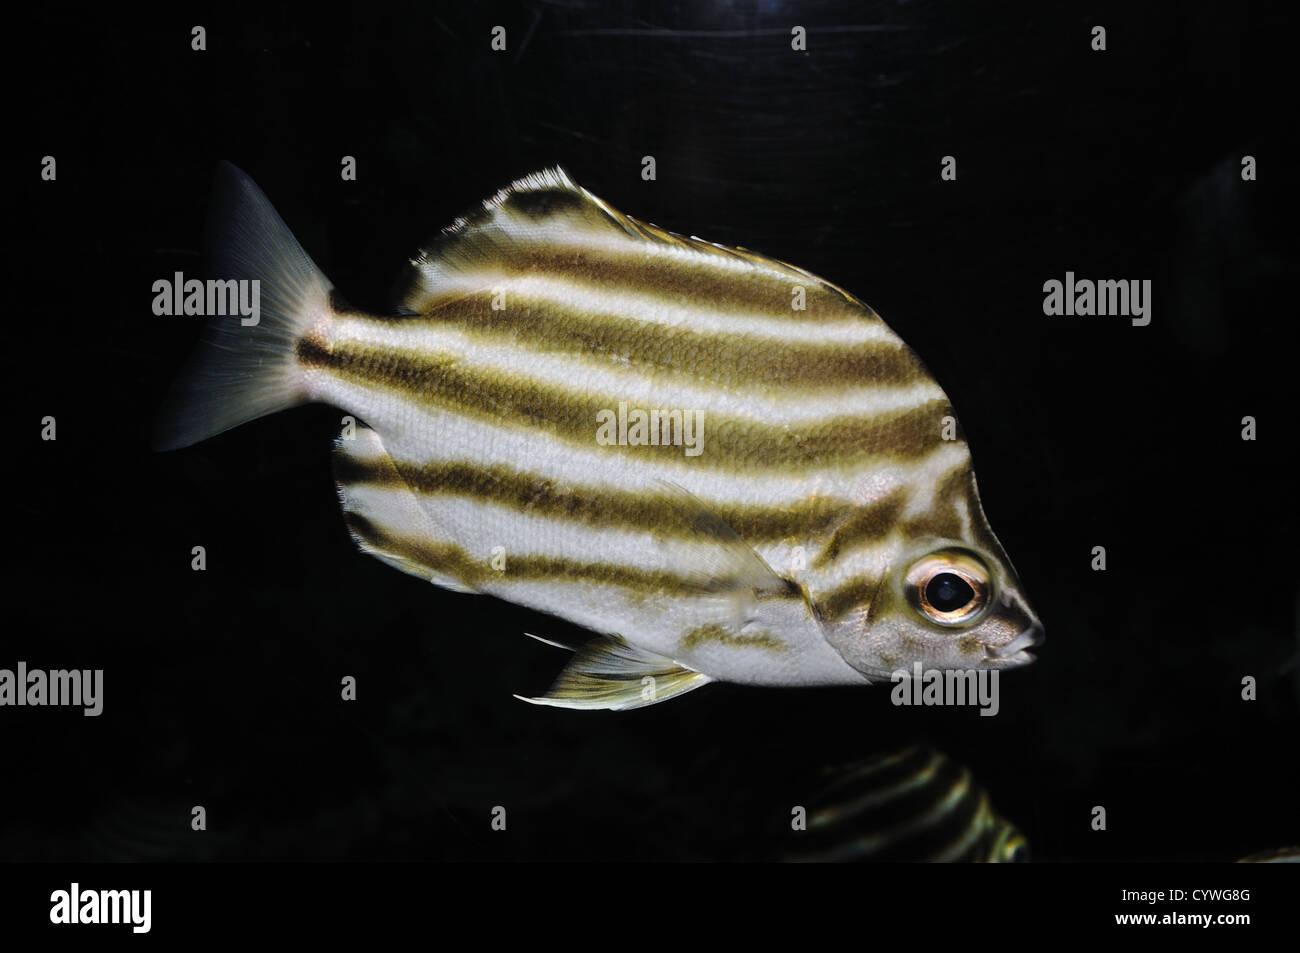 Stripey australiano pez contra fondo negro Imagen De Stock